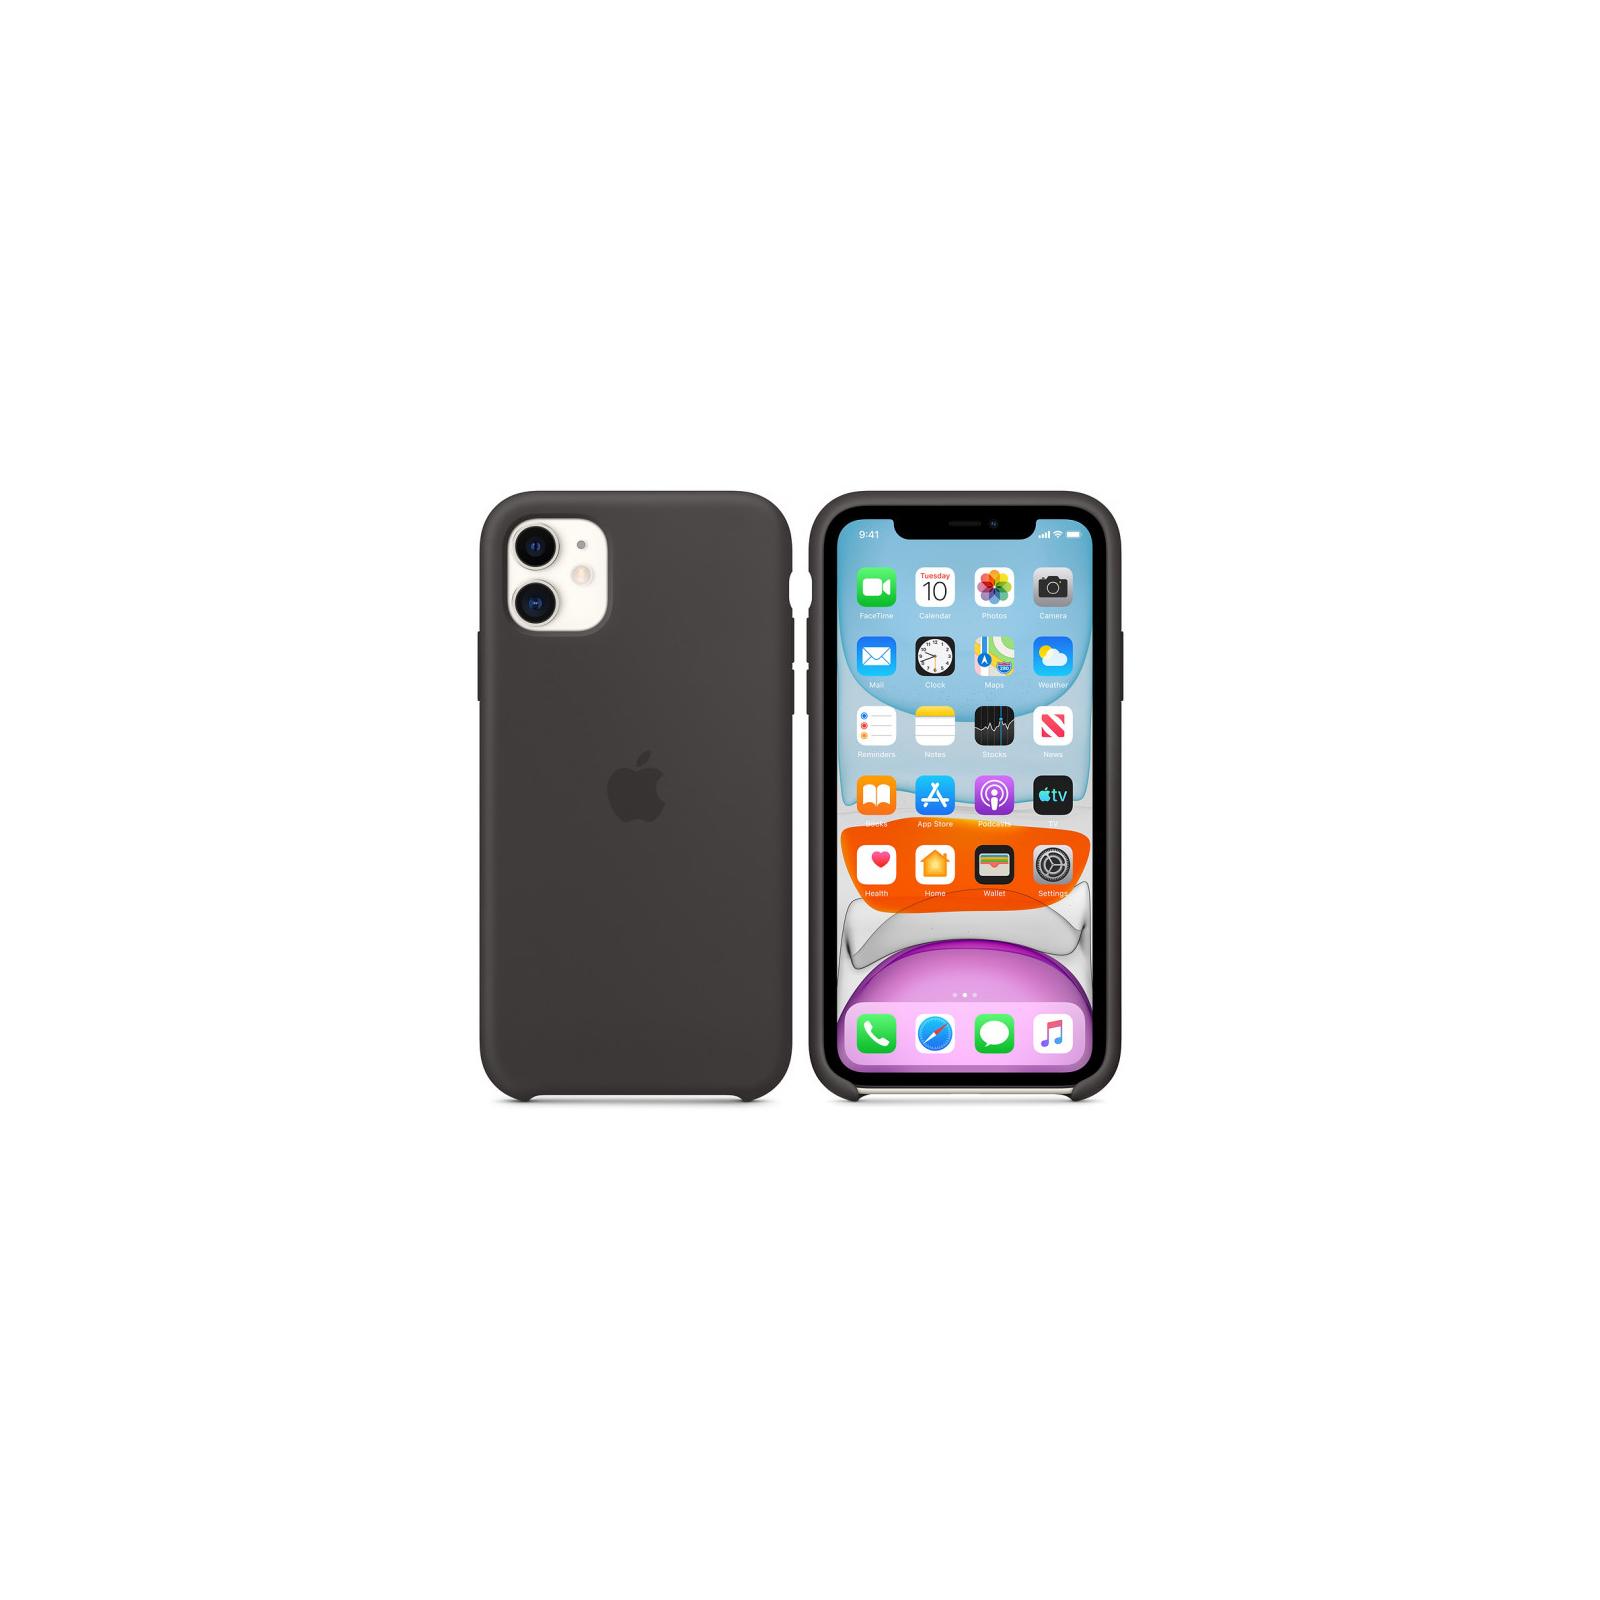 Чехол для моб. телефона Apple iPhone 11 Silicone Case - Black (MWVU2ZM/A) изображение 8